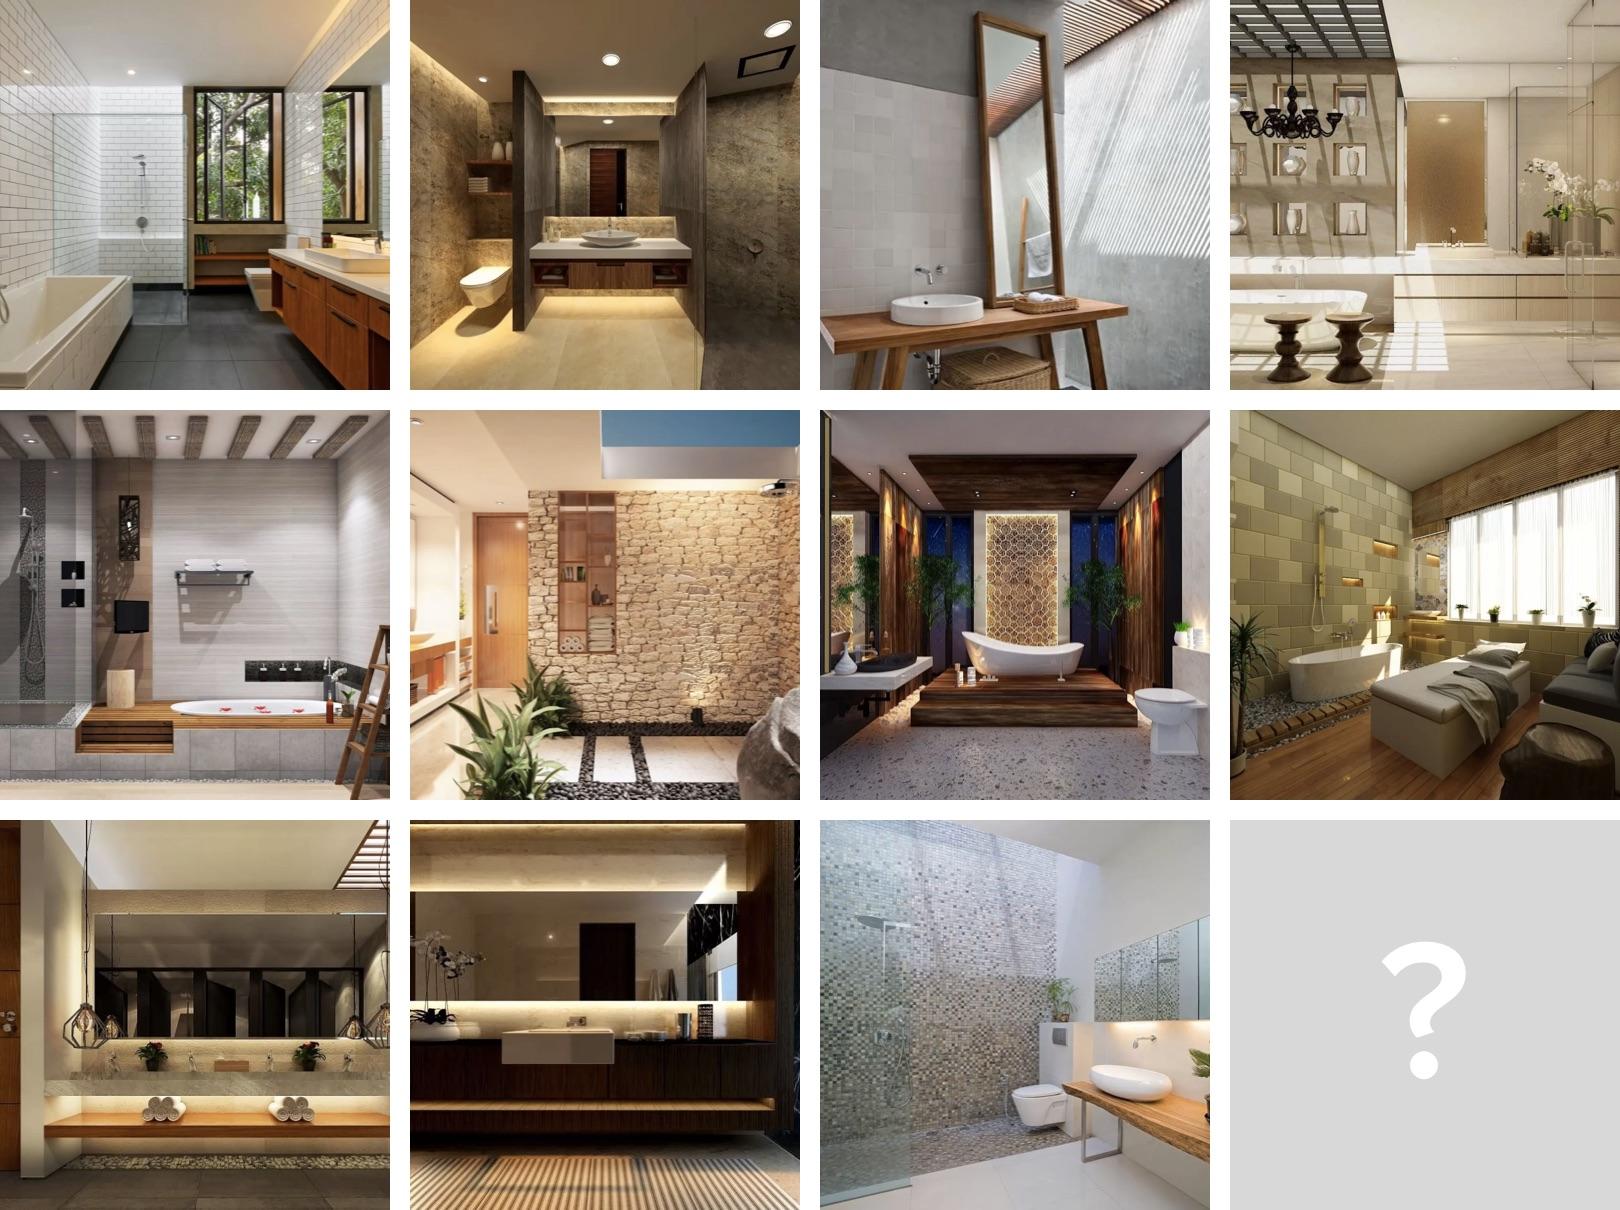 11 Inspirasi Ide Desain Kamar Mandi Minimalis Eksotis Desain Terbaru